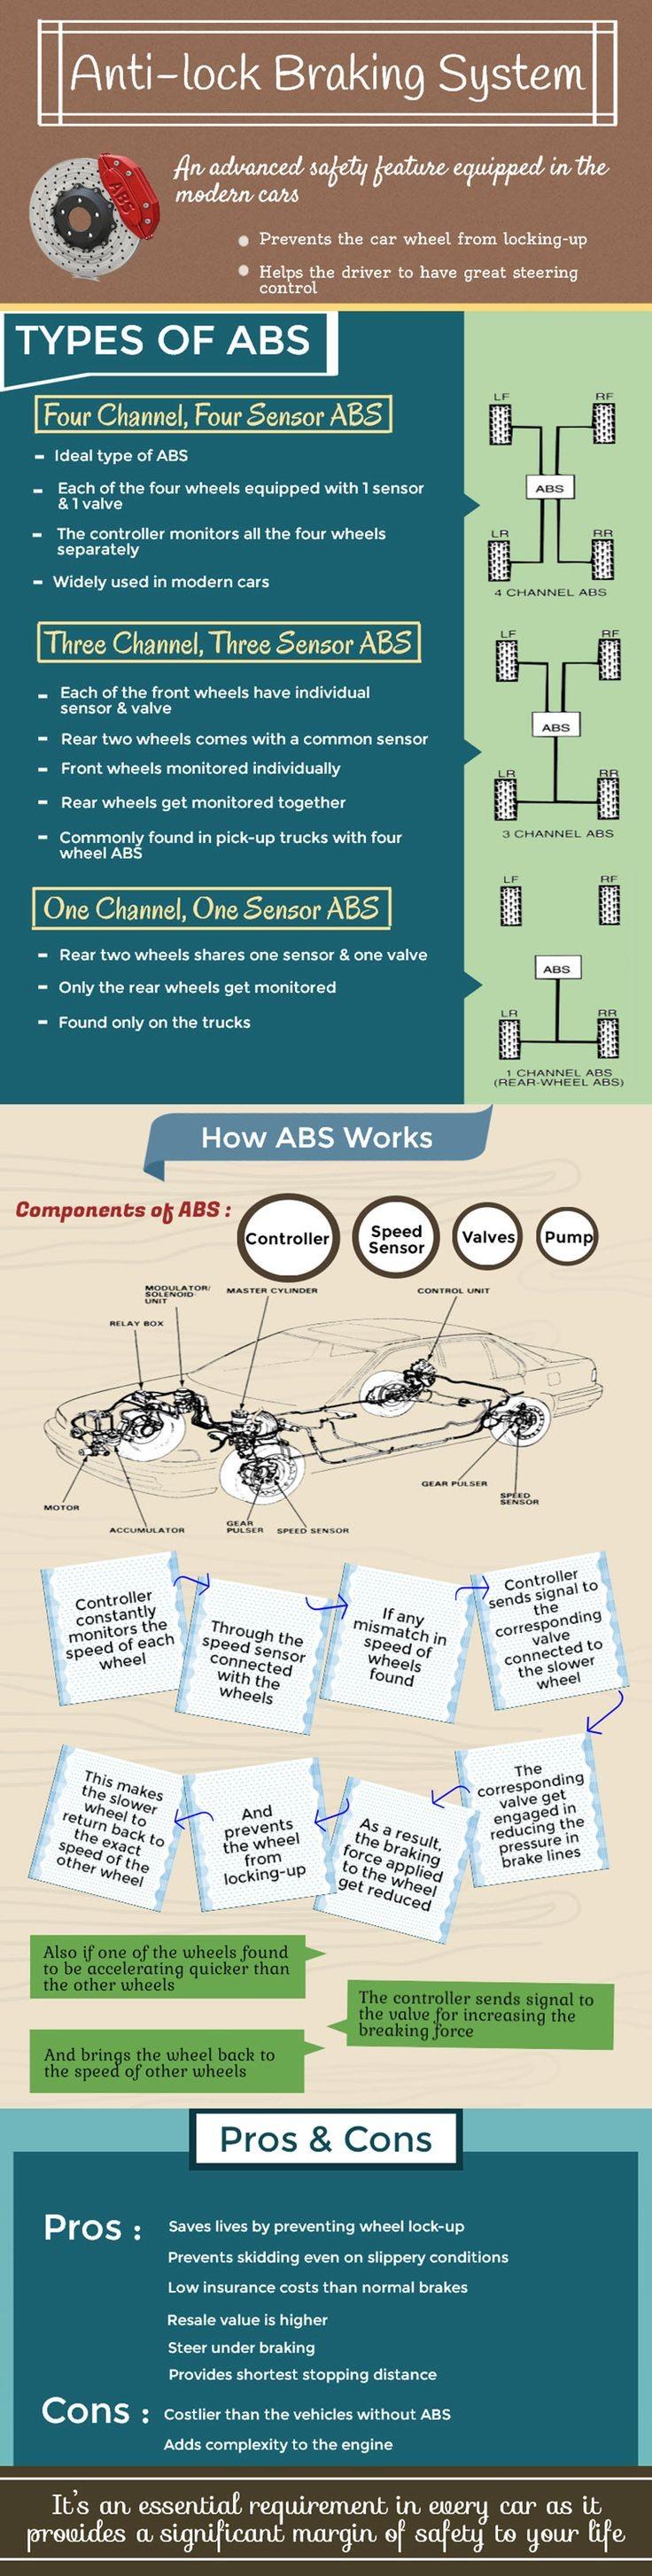 Abs Brake System Diagram Management Unit Diagrams Besides Freightliner M2 Amu Wiring Of Anti Lock Braking Systems Wingate Motors